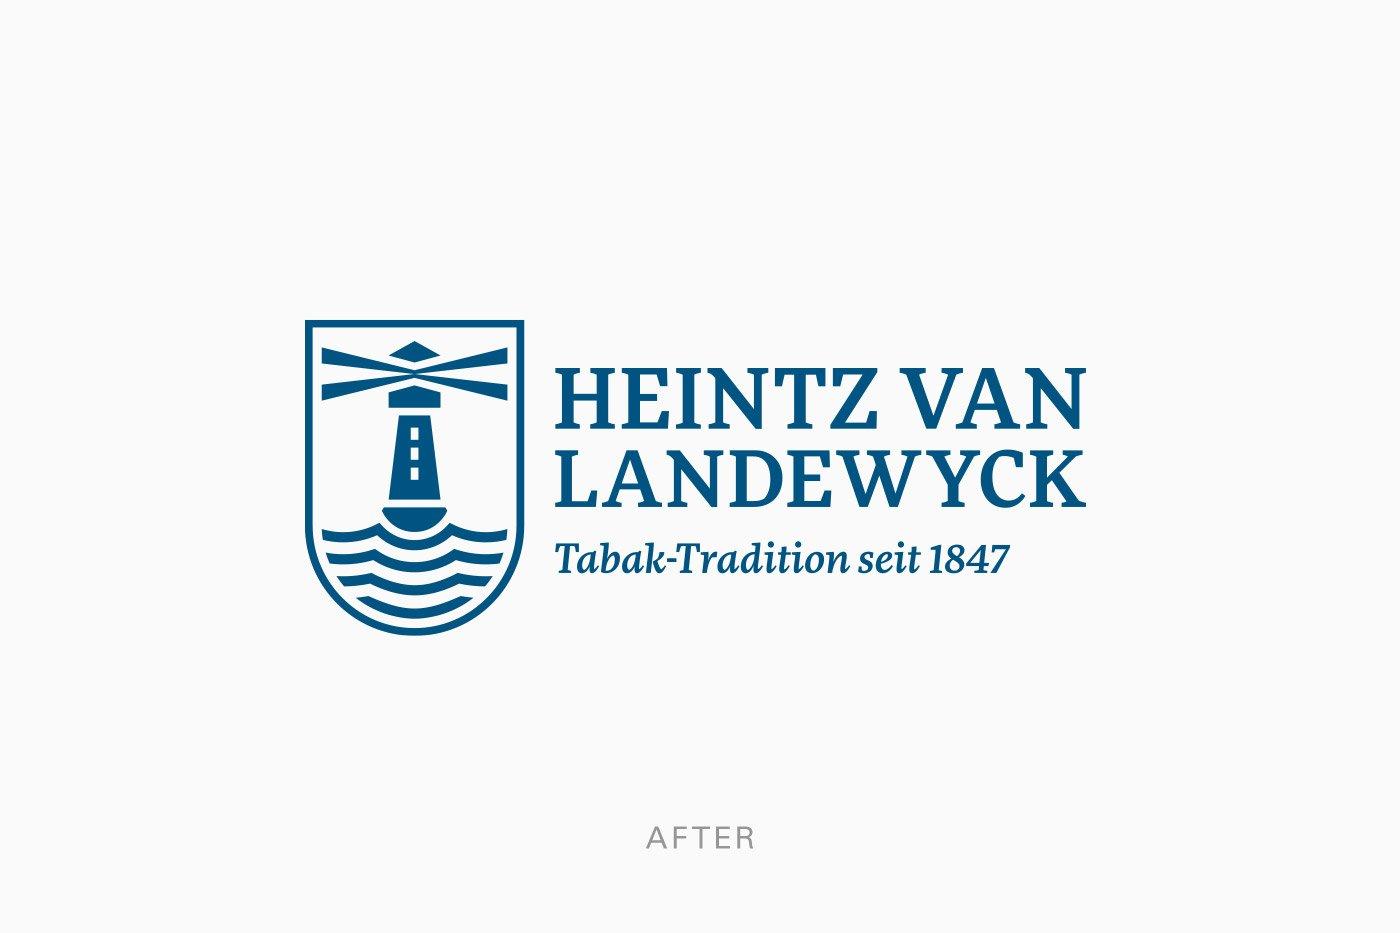 https://duktor.lu/wp-content/uploads/2020/10/duktor-projekt-heintz_van_landewyck_12.jpg